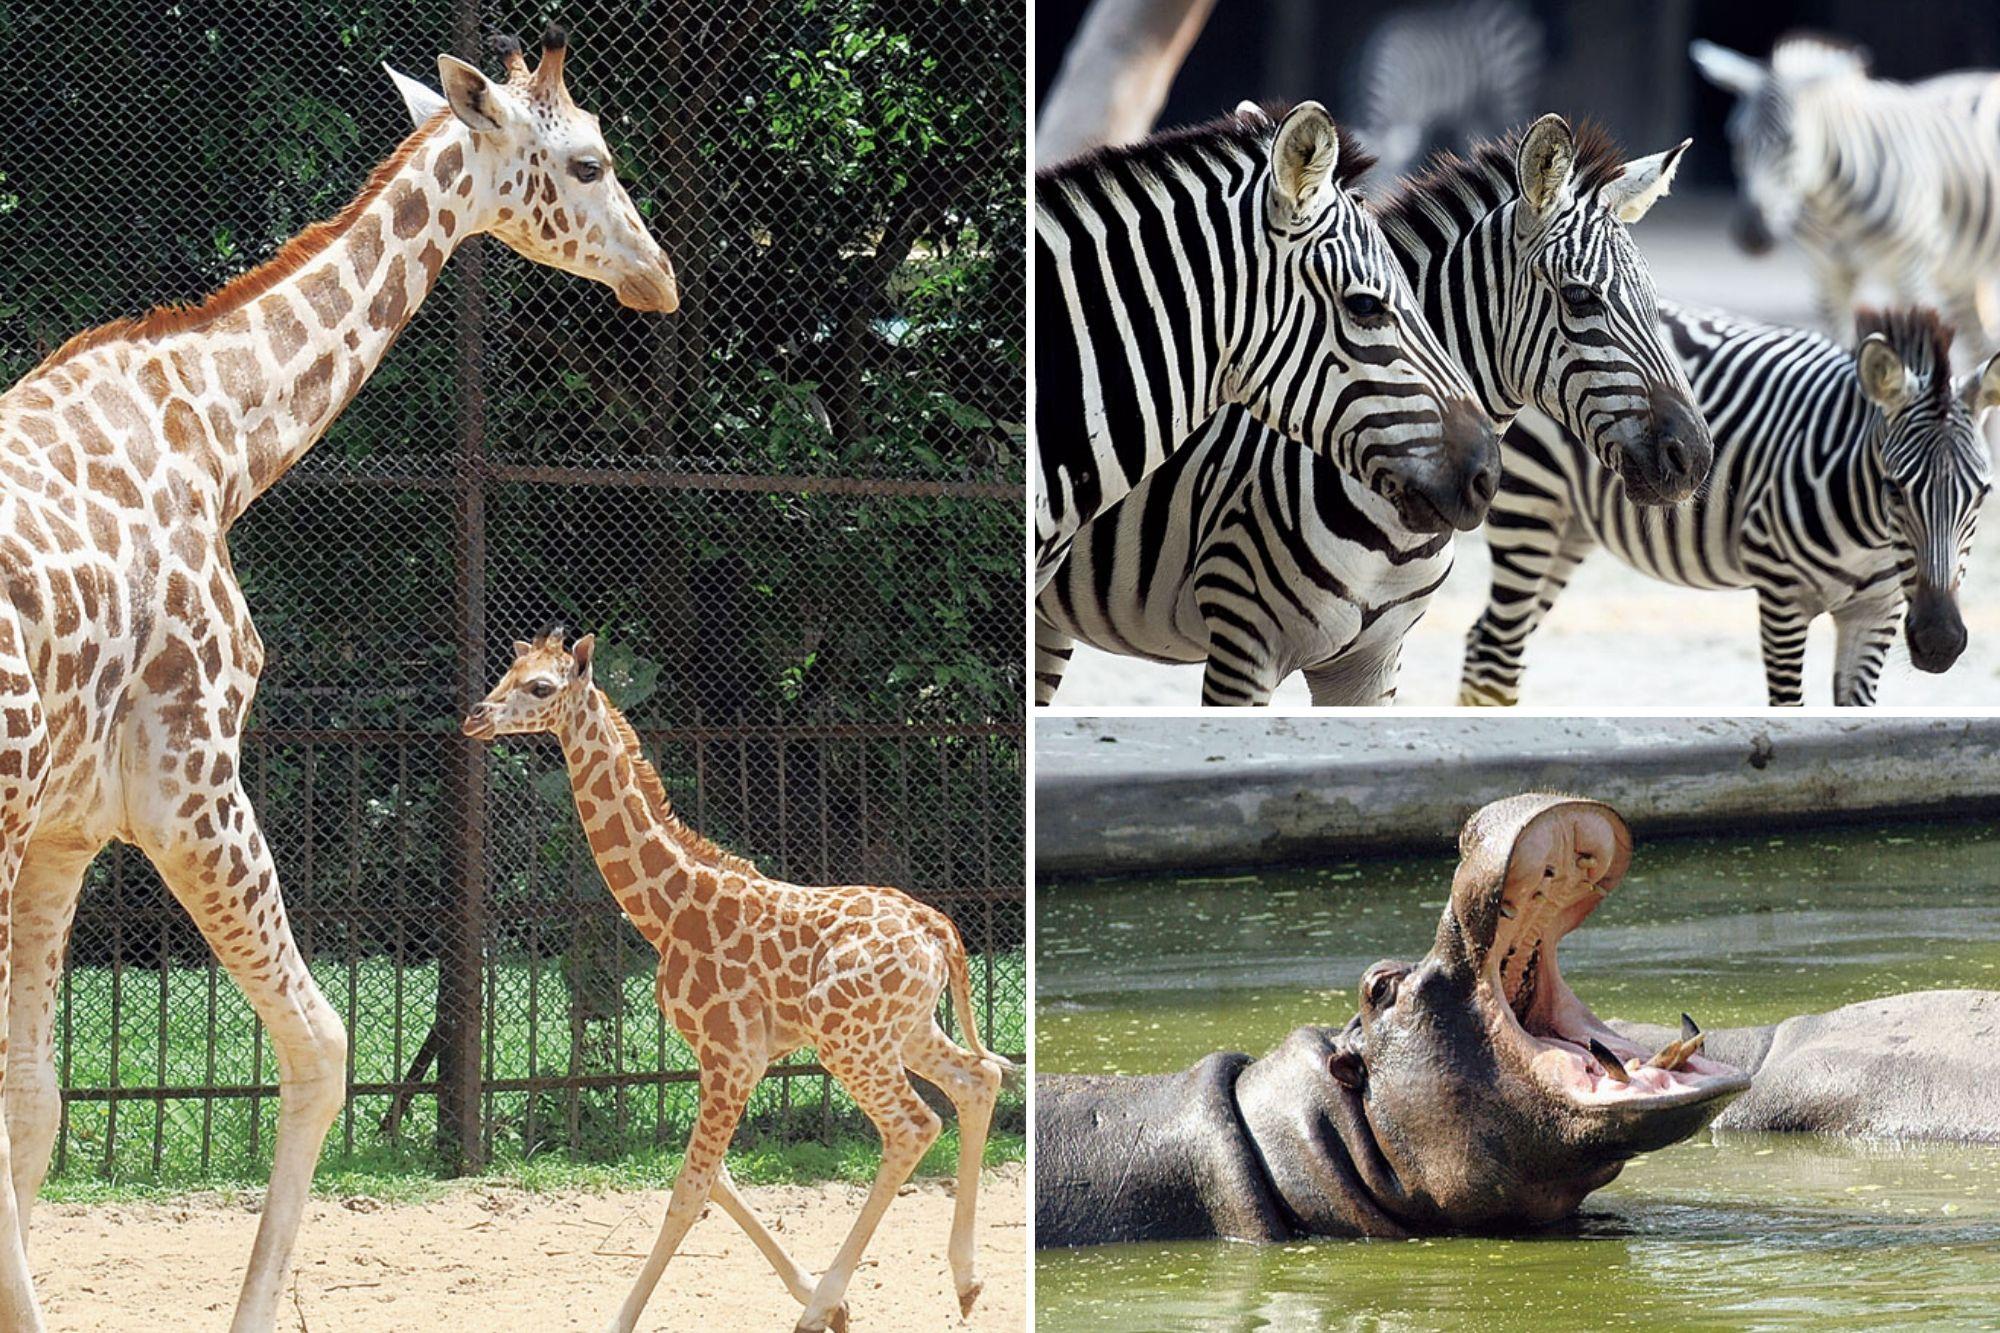 Zebras, hippopotamuses and giraffes at the Alipore Zoological Gardens